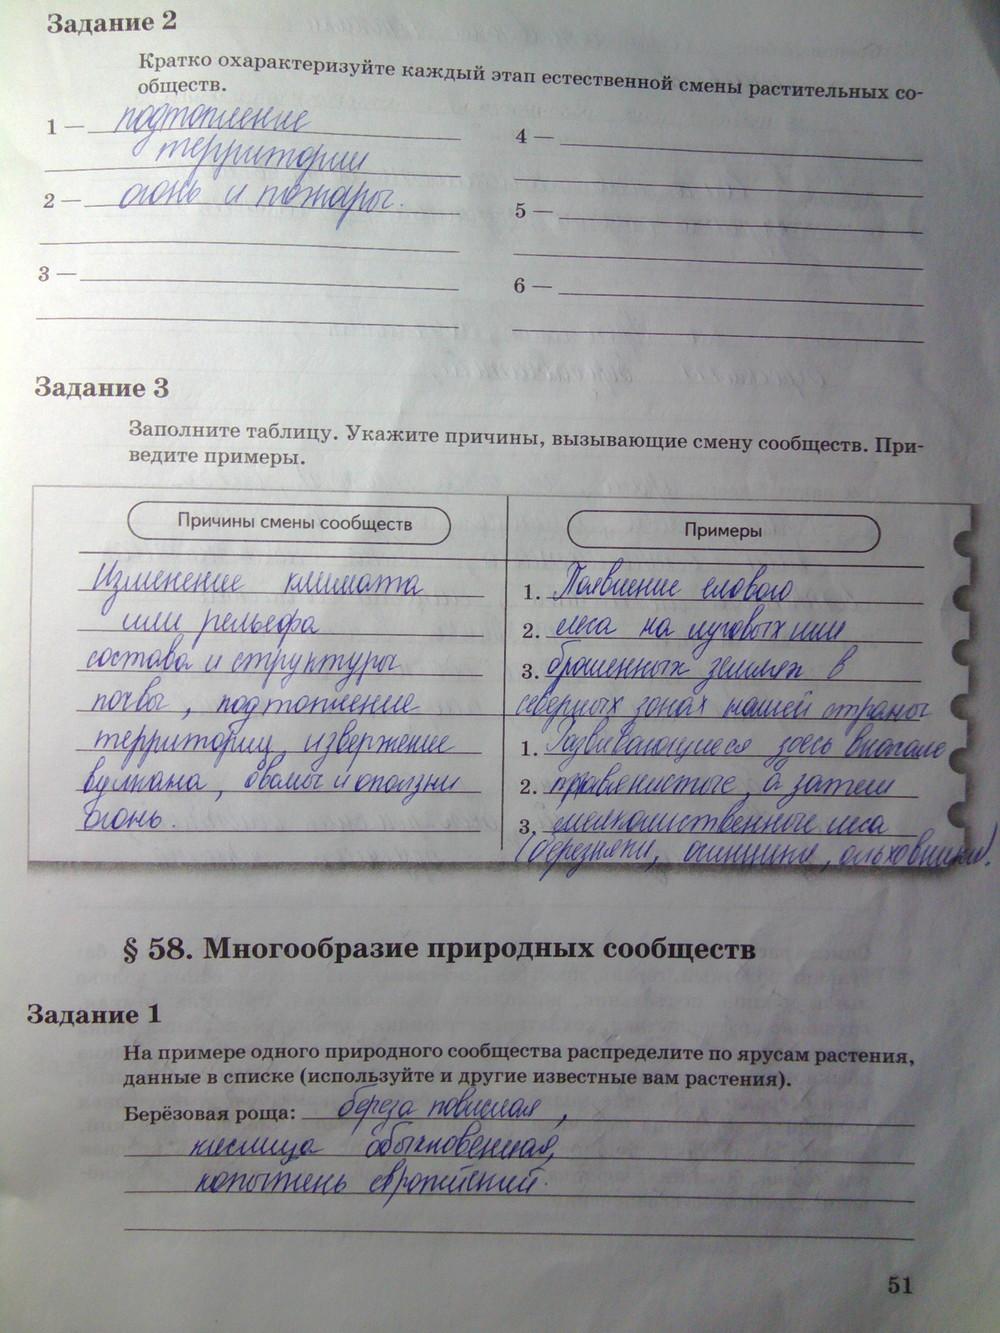 6 биология пономарева гдз класс